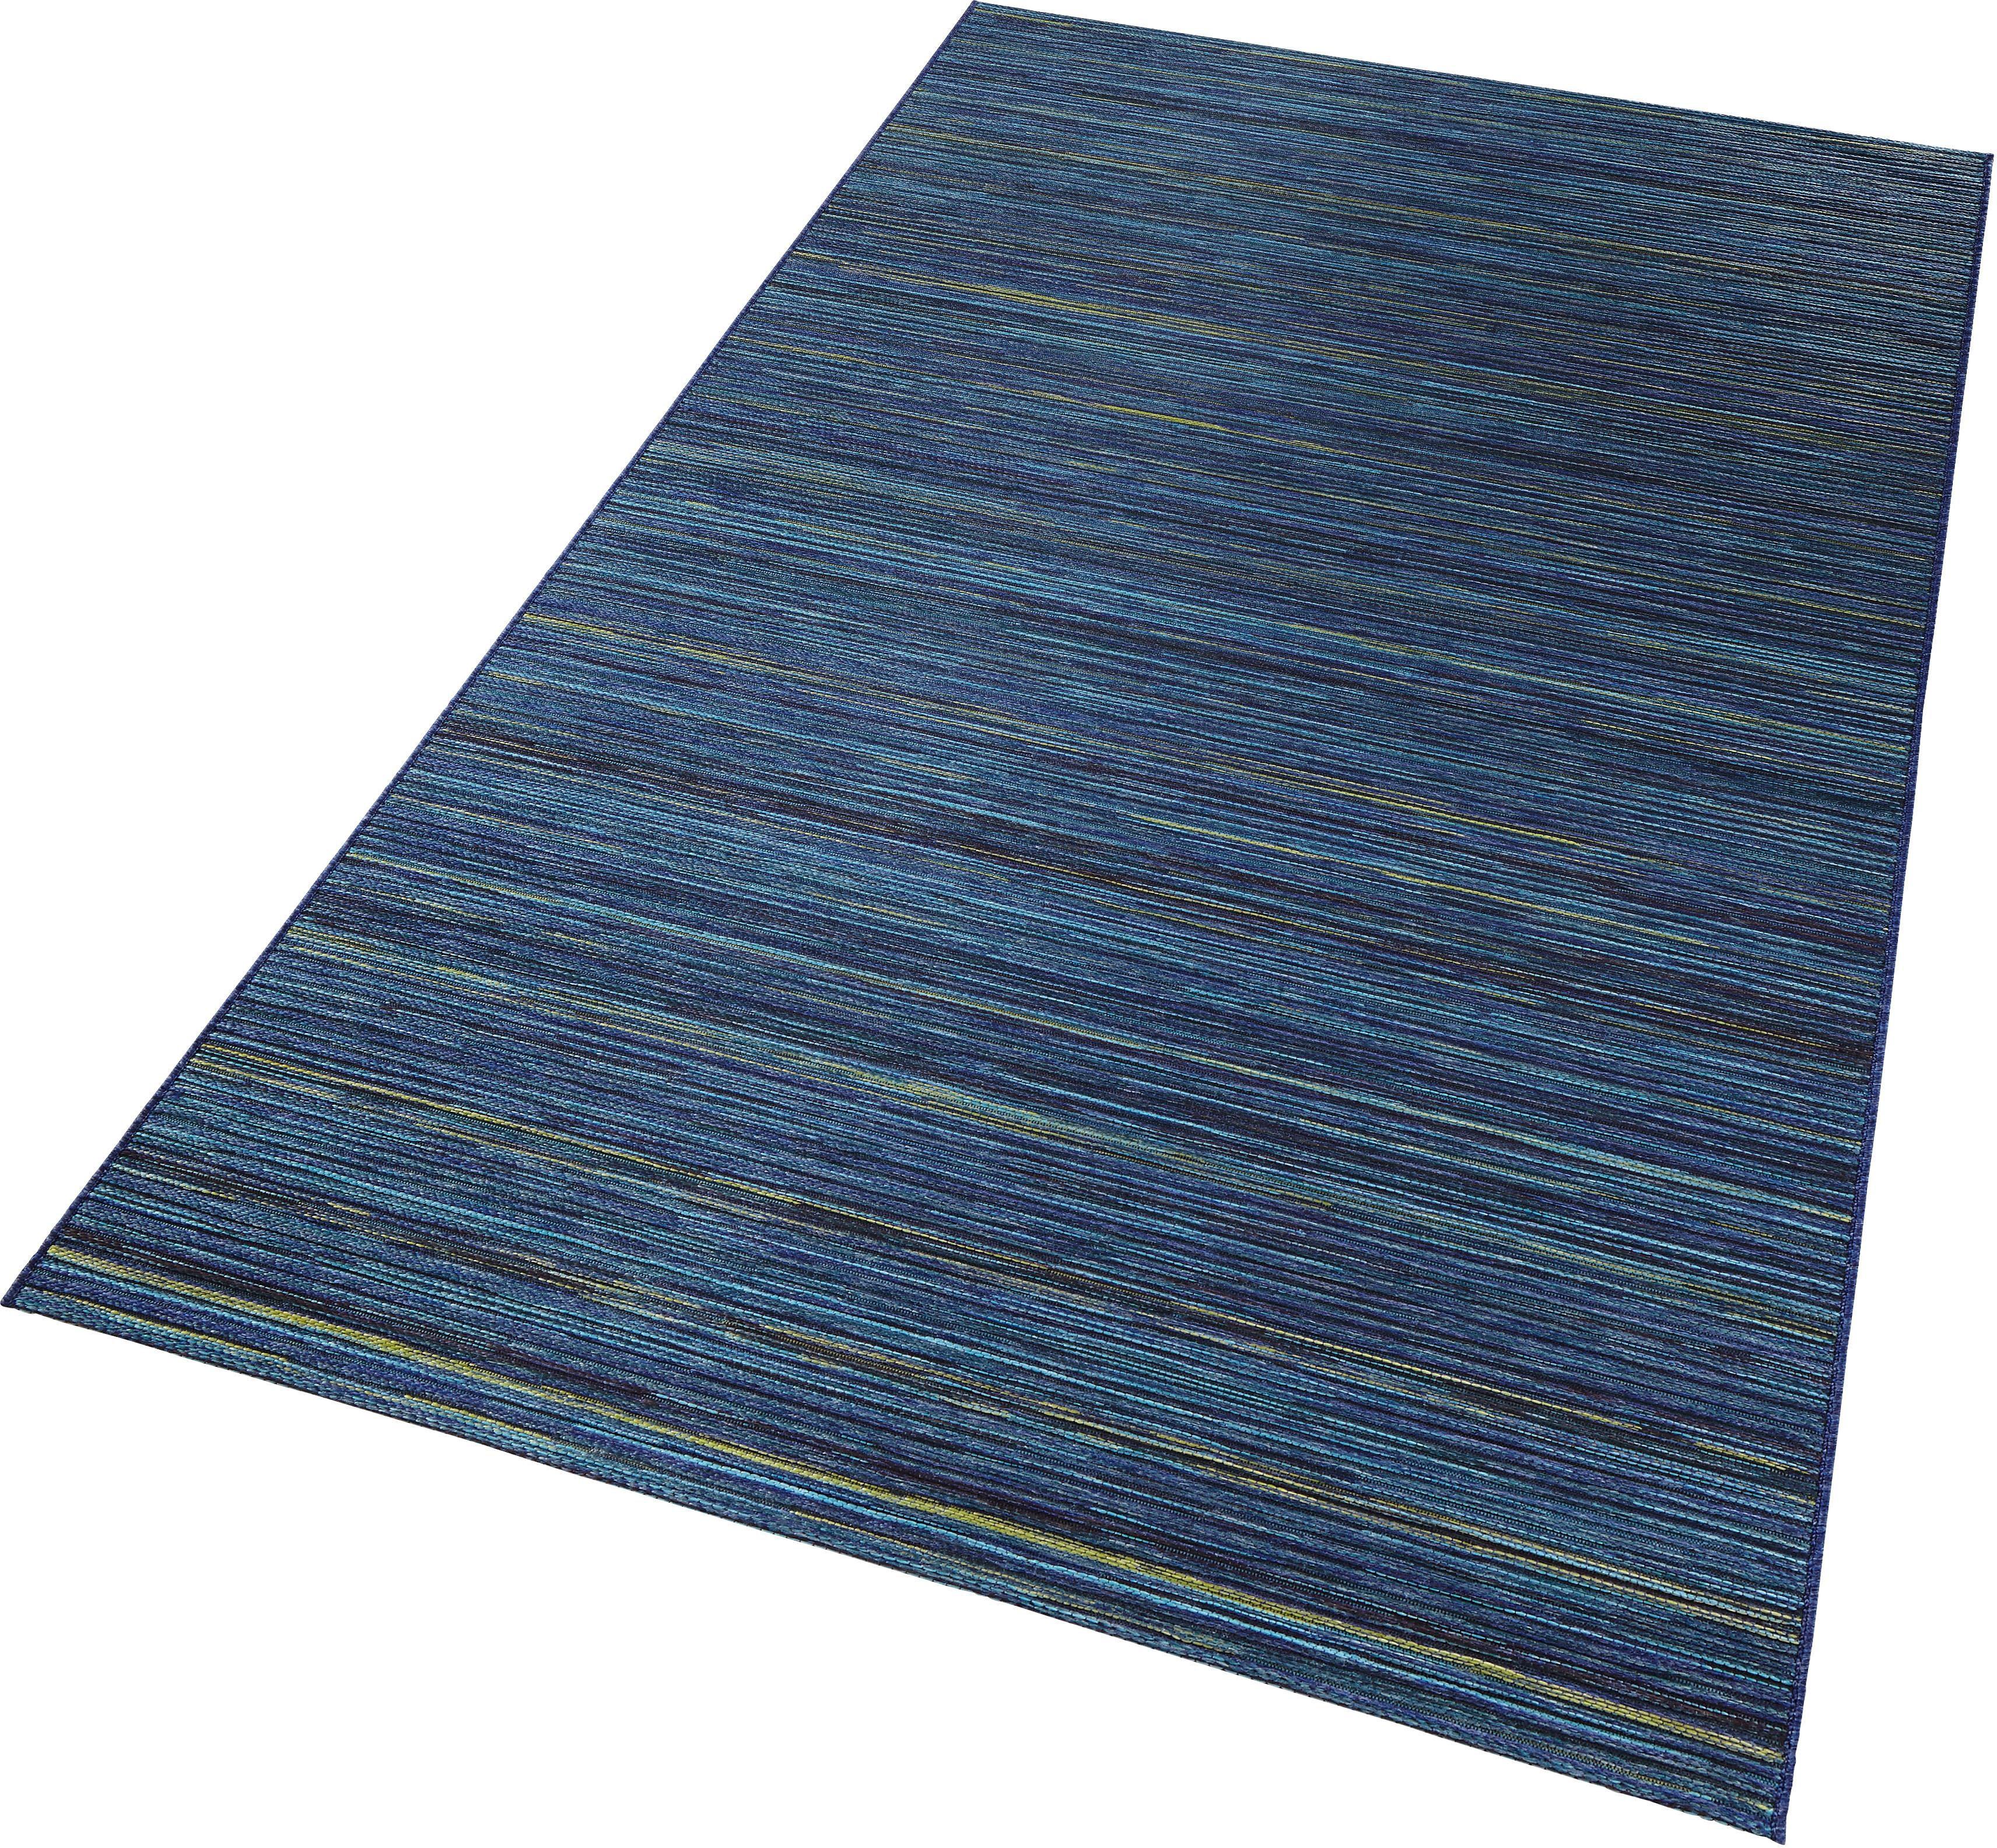 Teppich Lotus bougari rechteckig Höhe 7 mm maschinell gewebt